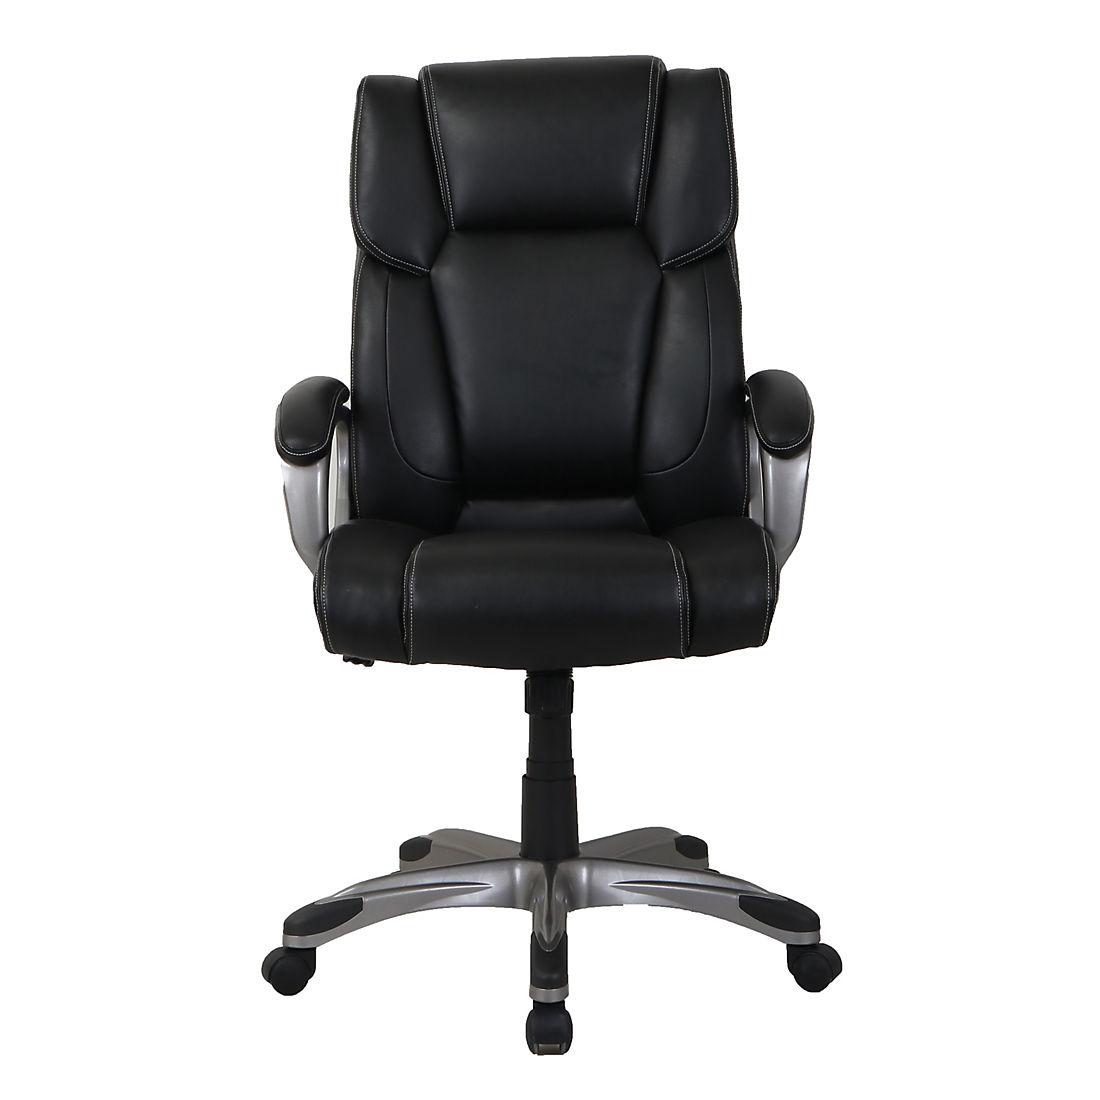 Outstanding Berkley Jensen Bonded Leather Manager Chair Black Cjindustries Chair Design For Home Cjindustriesco